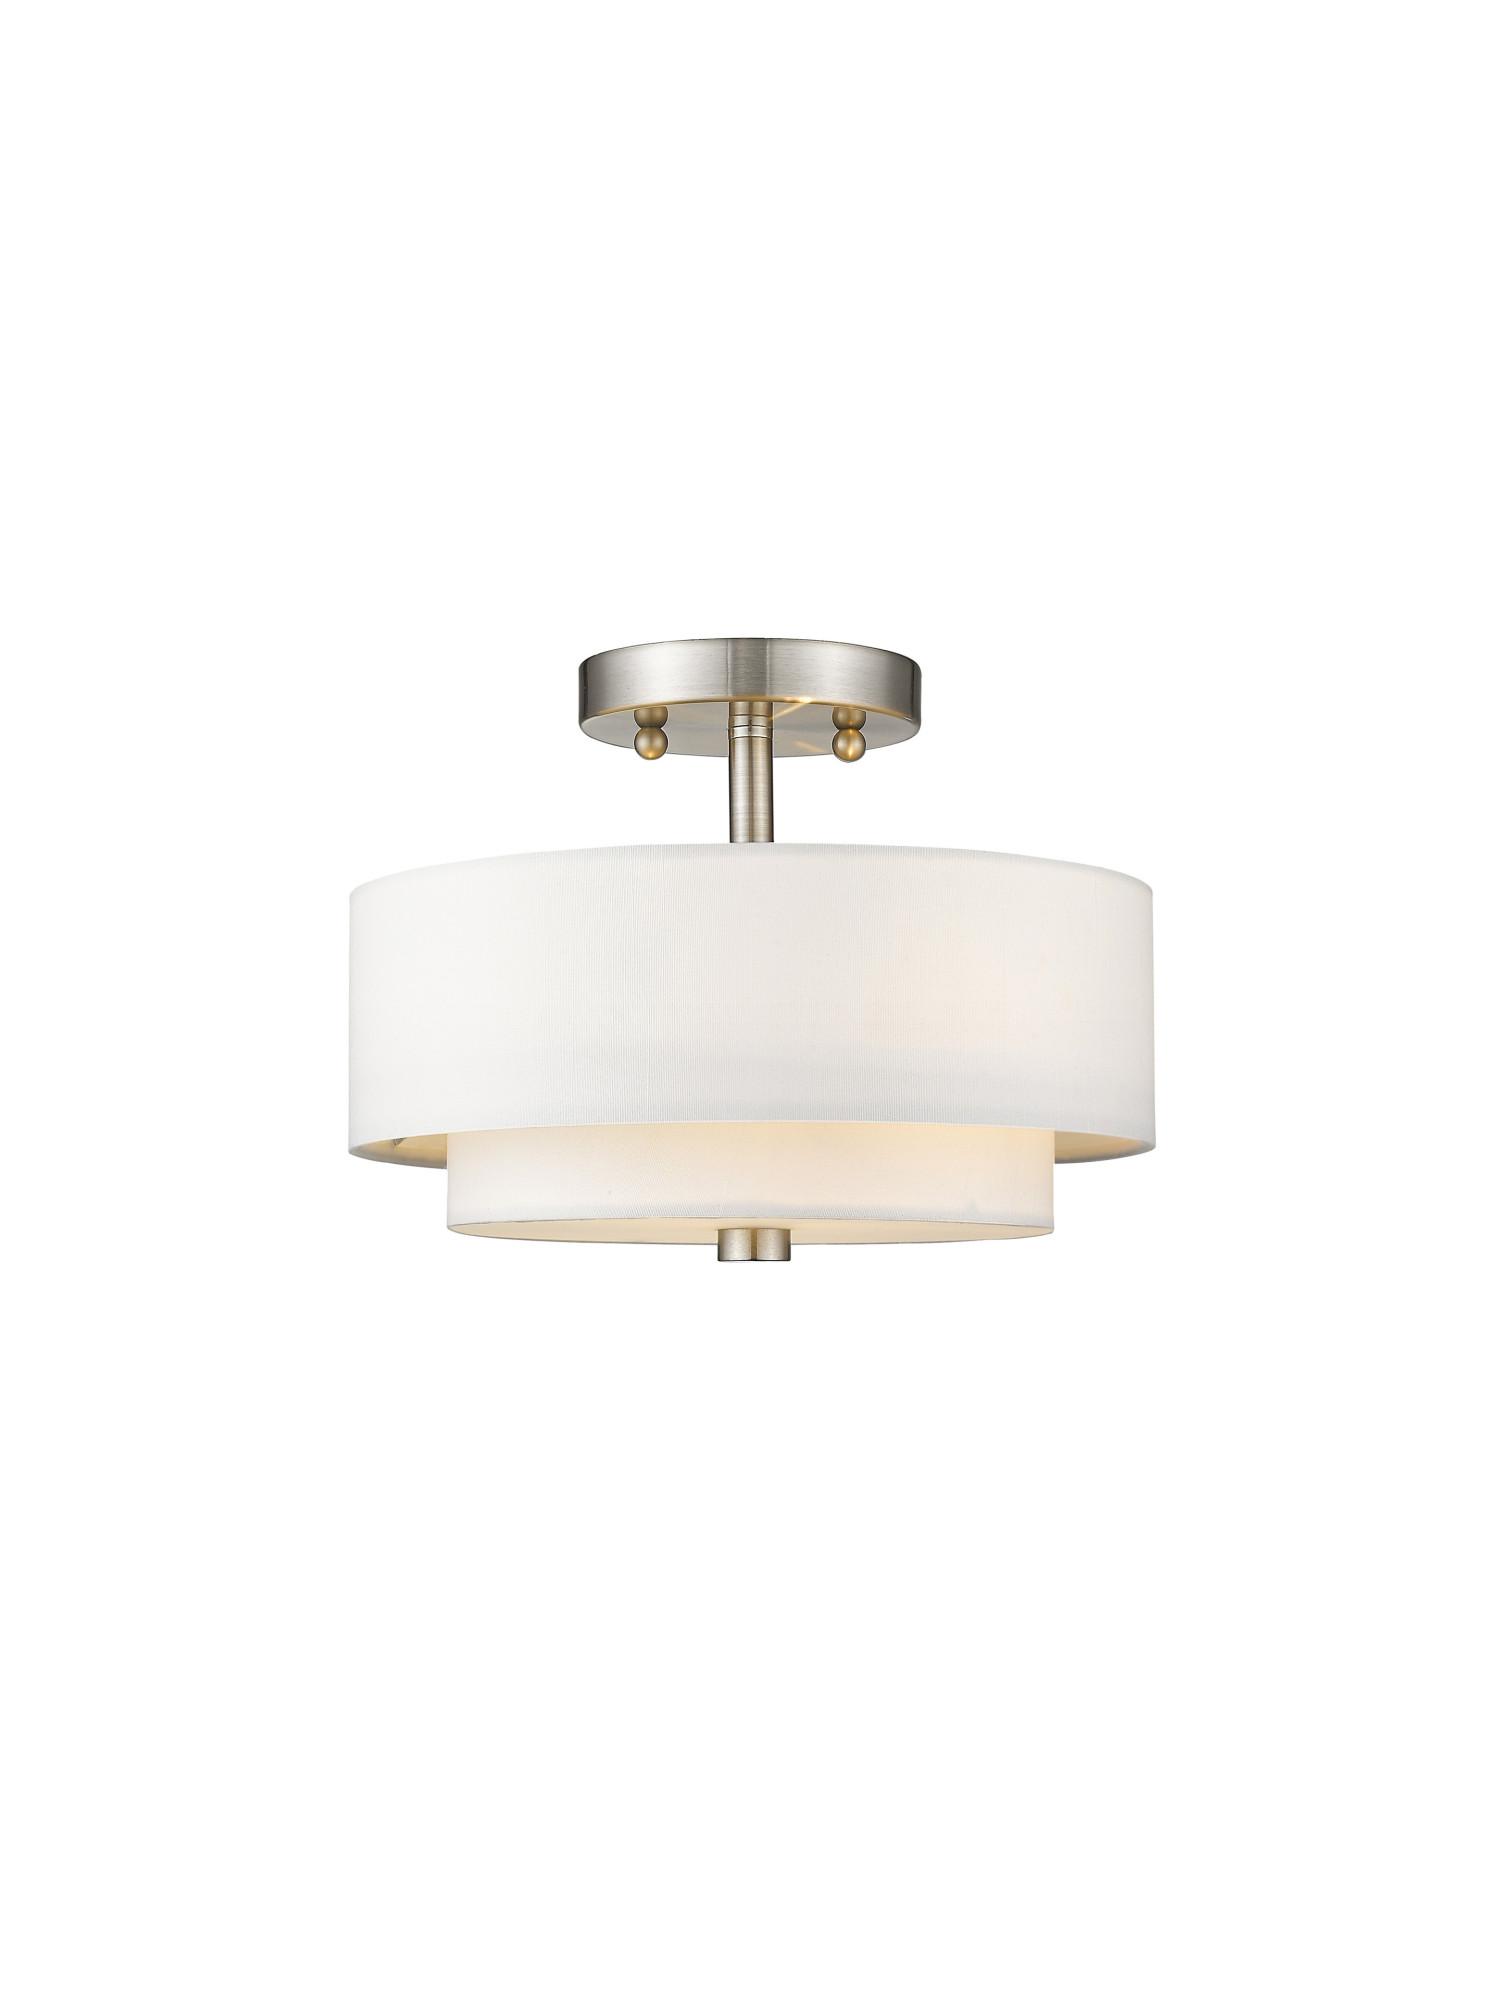 Livex Lighting 51042 Nickel Claremont 2-Light Semi Flush Cei